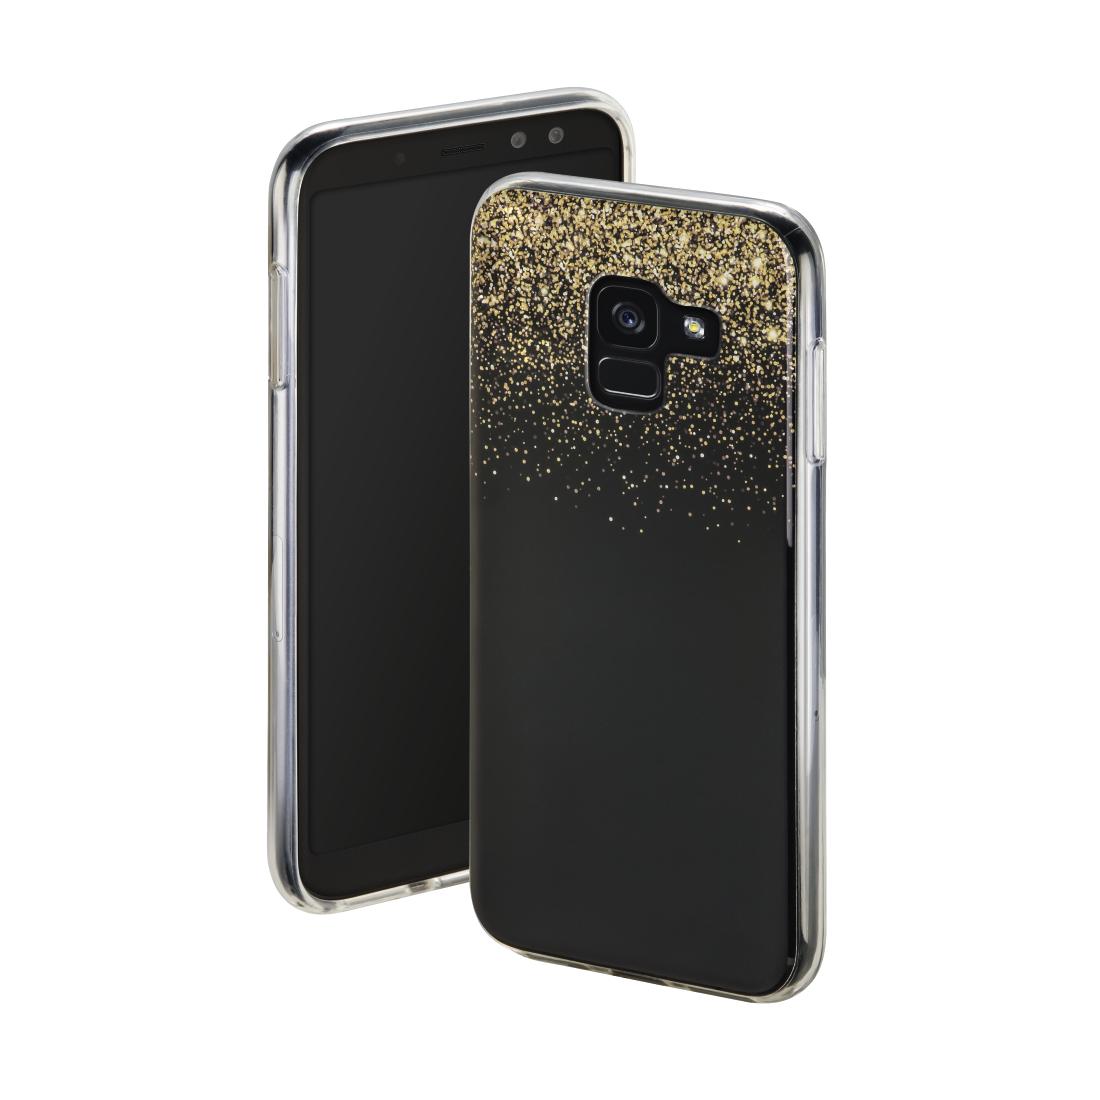 00172131 Hama Cover Golden Rain Fur Samsung Galaxy A8 2018